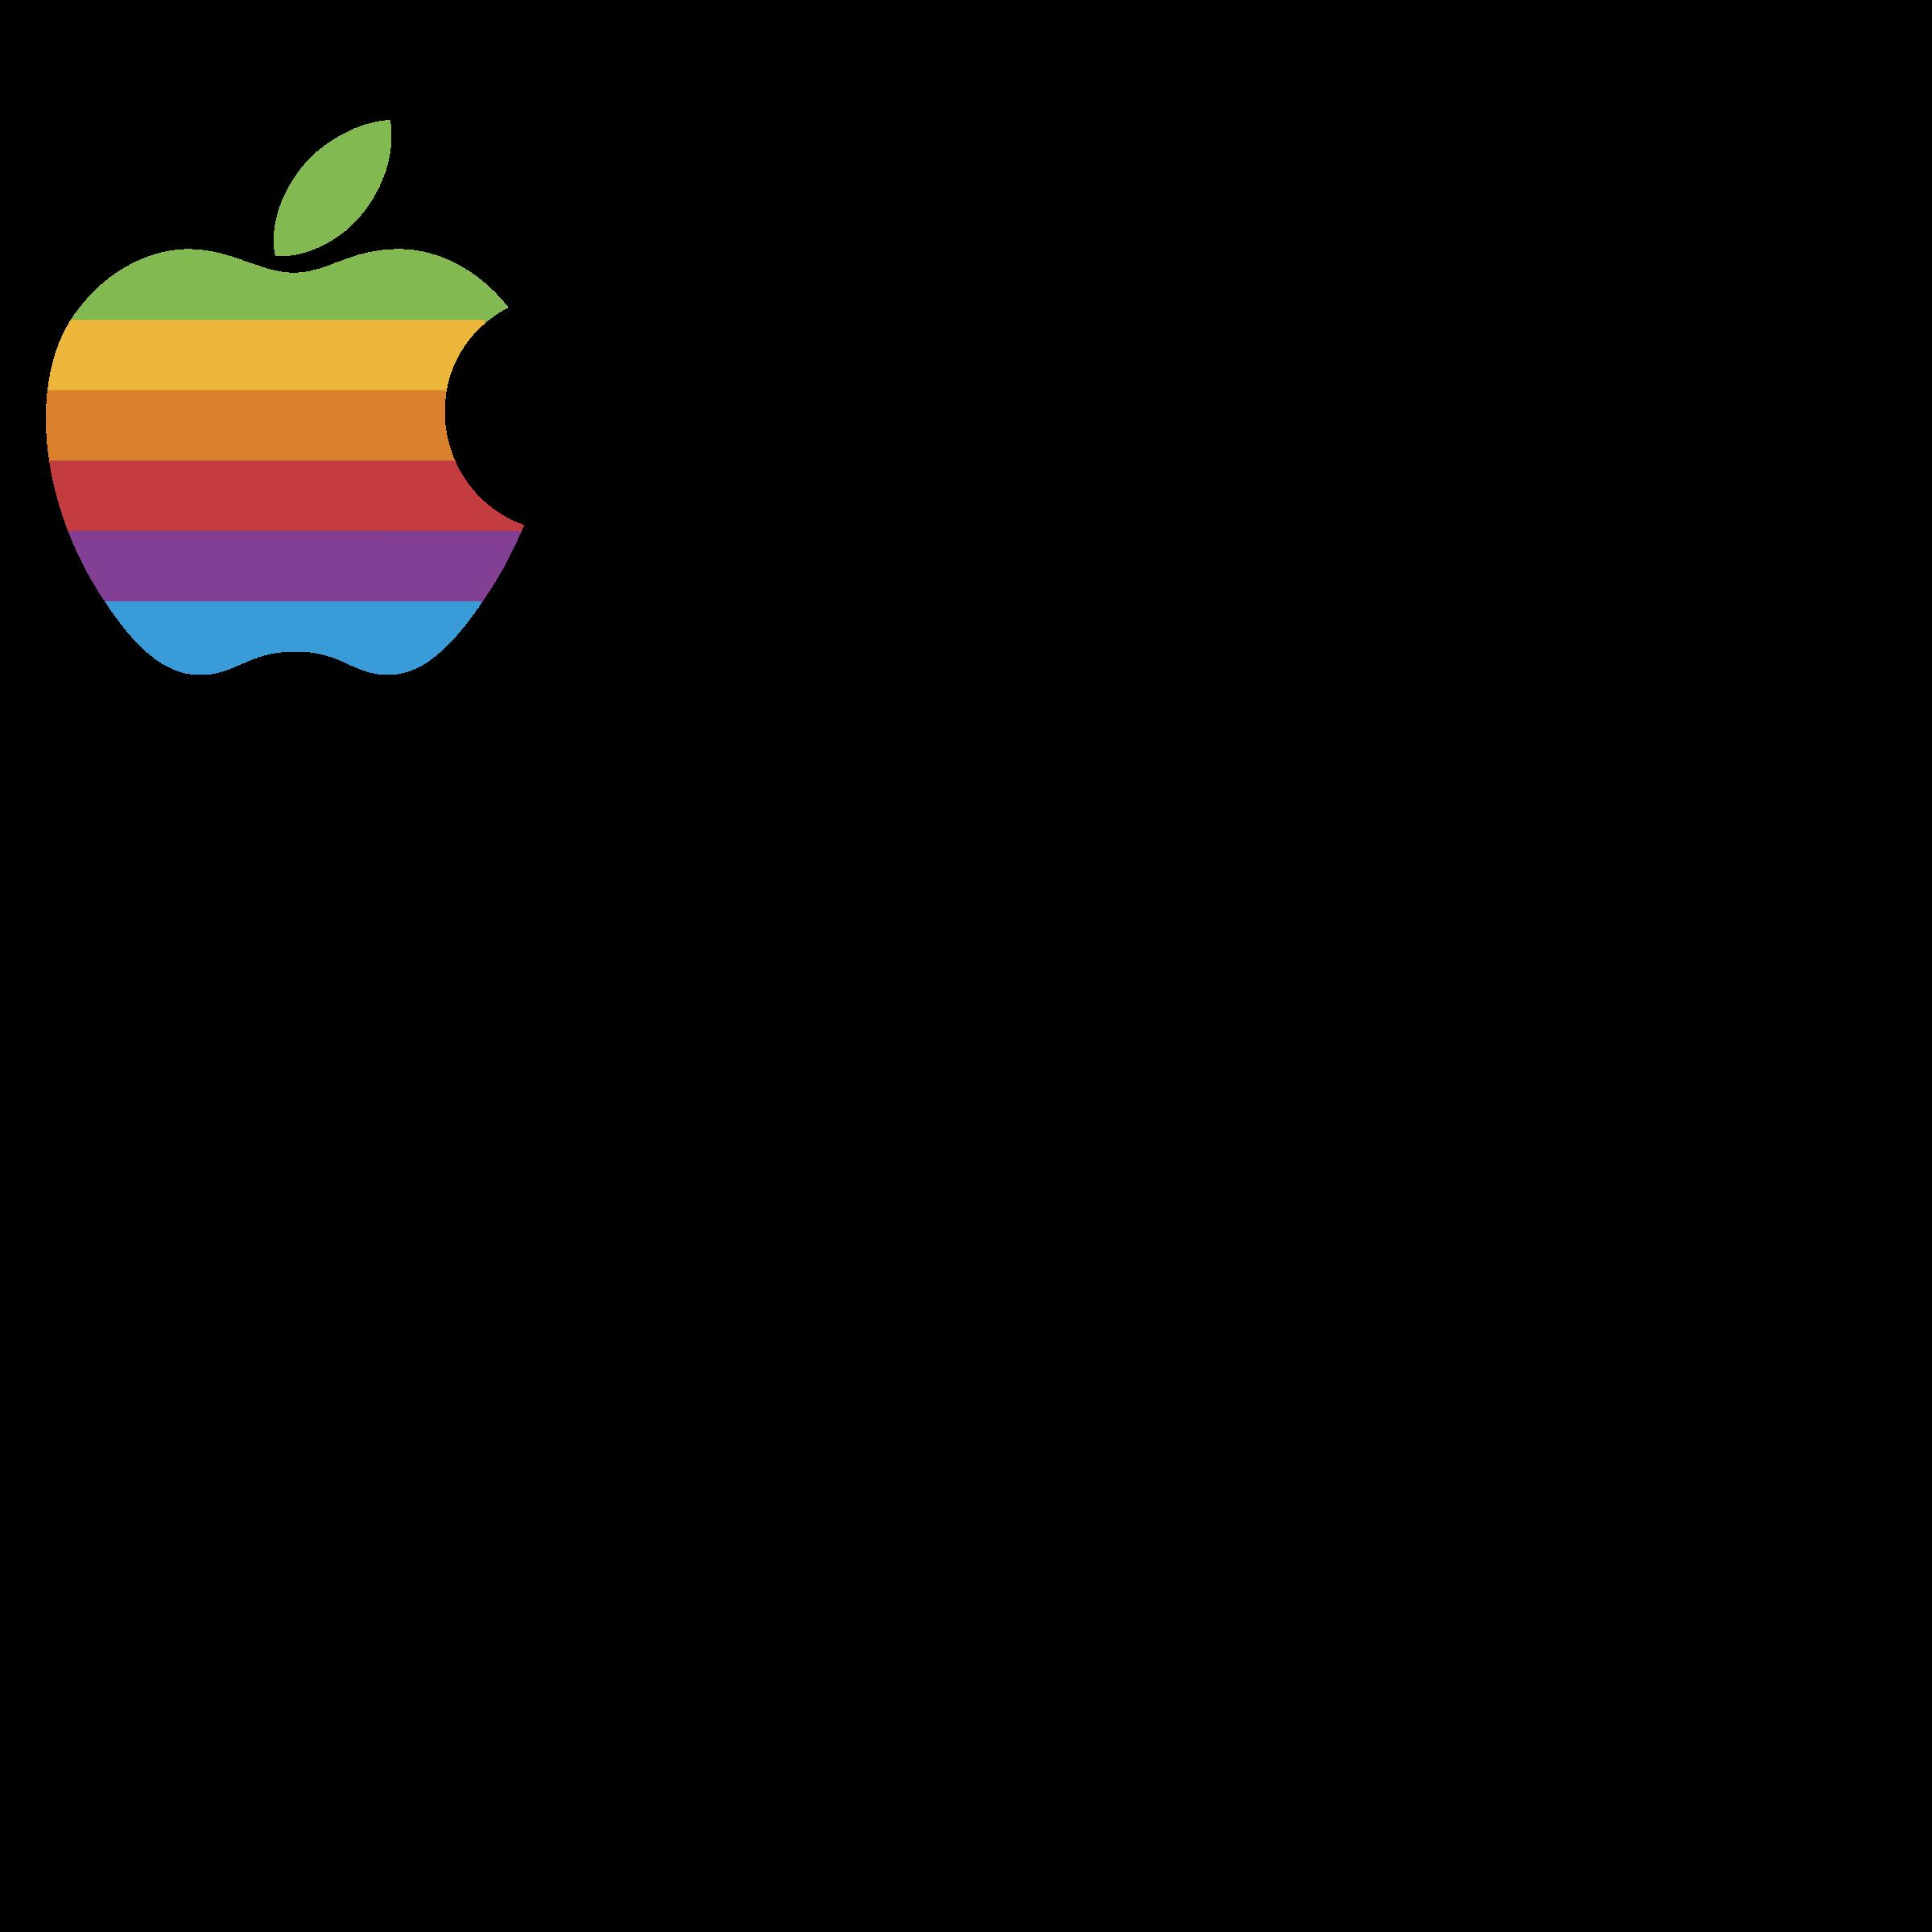 Apple logos or banner clipart clipart transparent Apple Logo PNG Transparent & SVG Vector - Freebie Supply clipart transparent